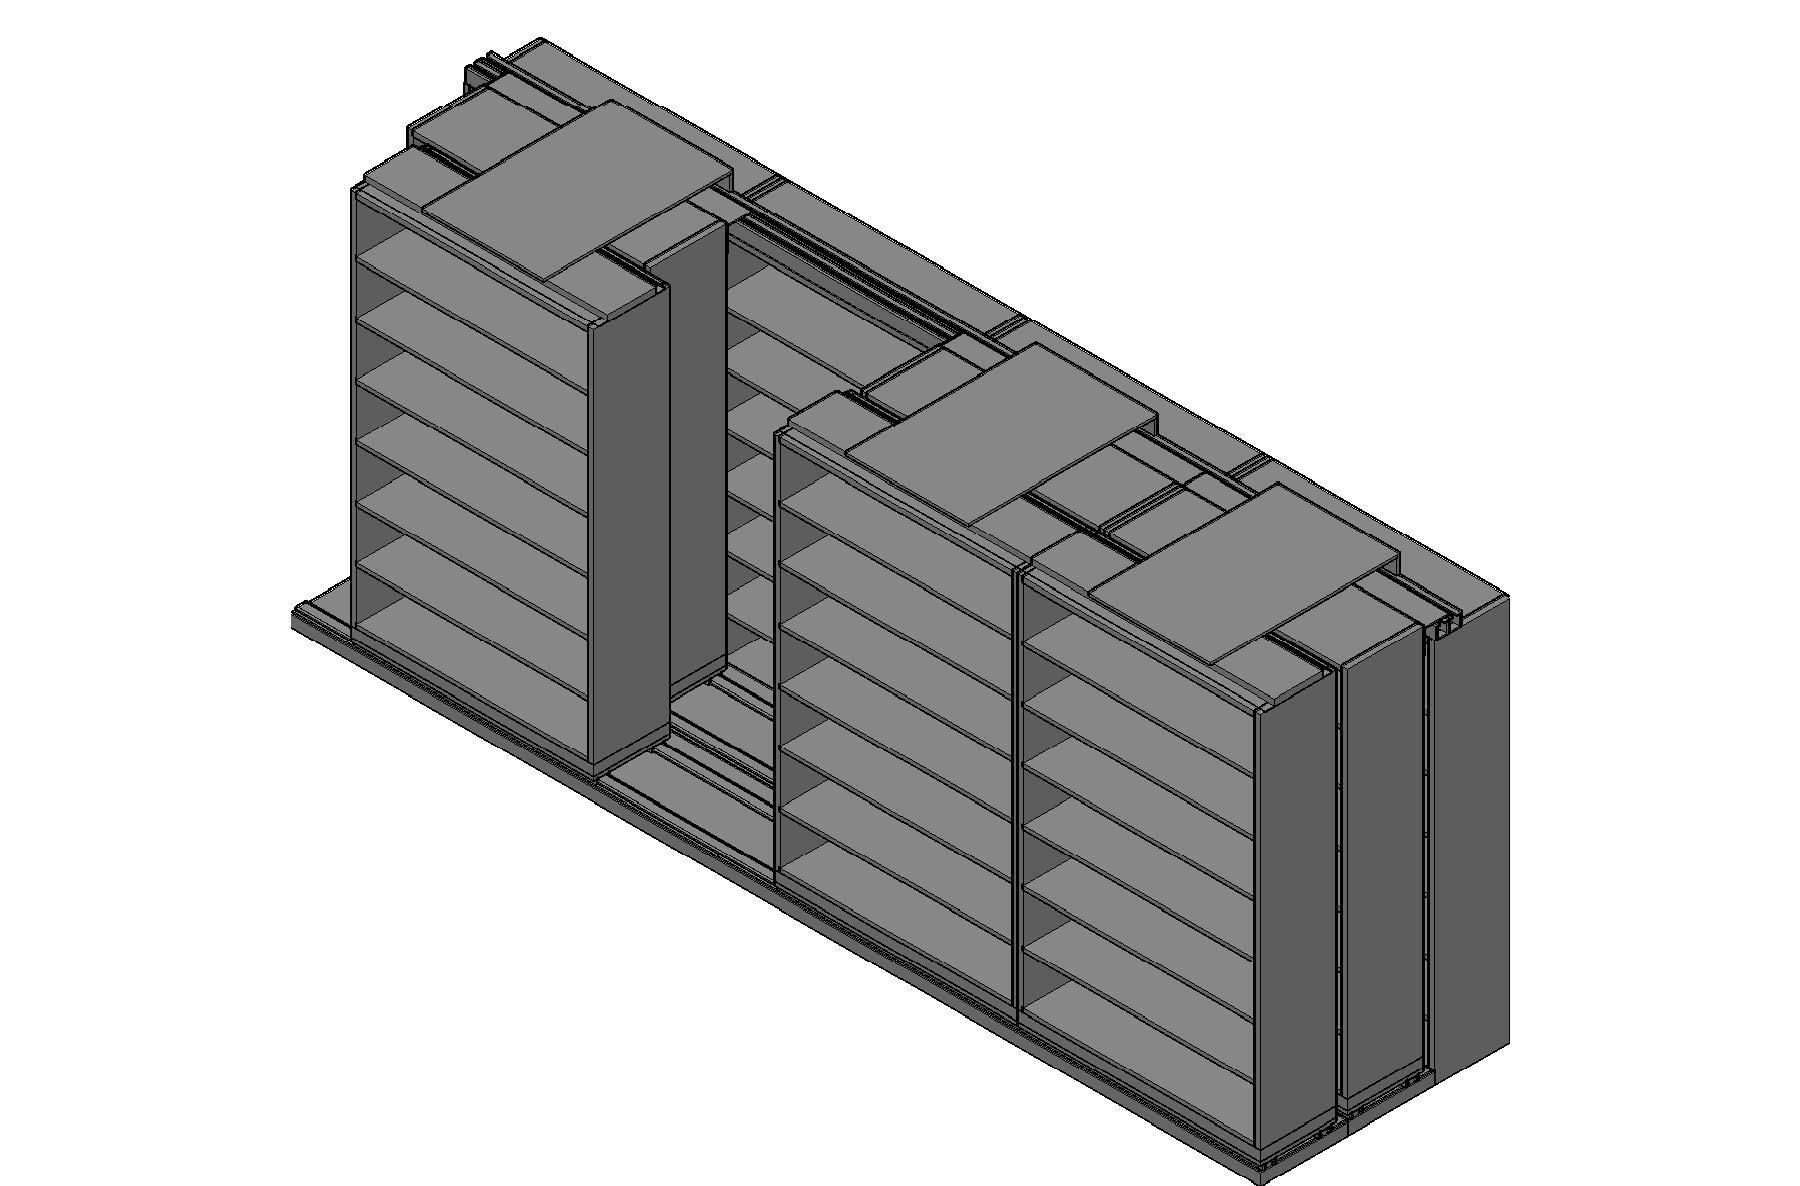 "Legal Size Sliding Shelves - 3 Rows Deep - 7 Levels - (48"" x 15"" Shelves) - 196"" Total Width"